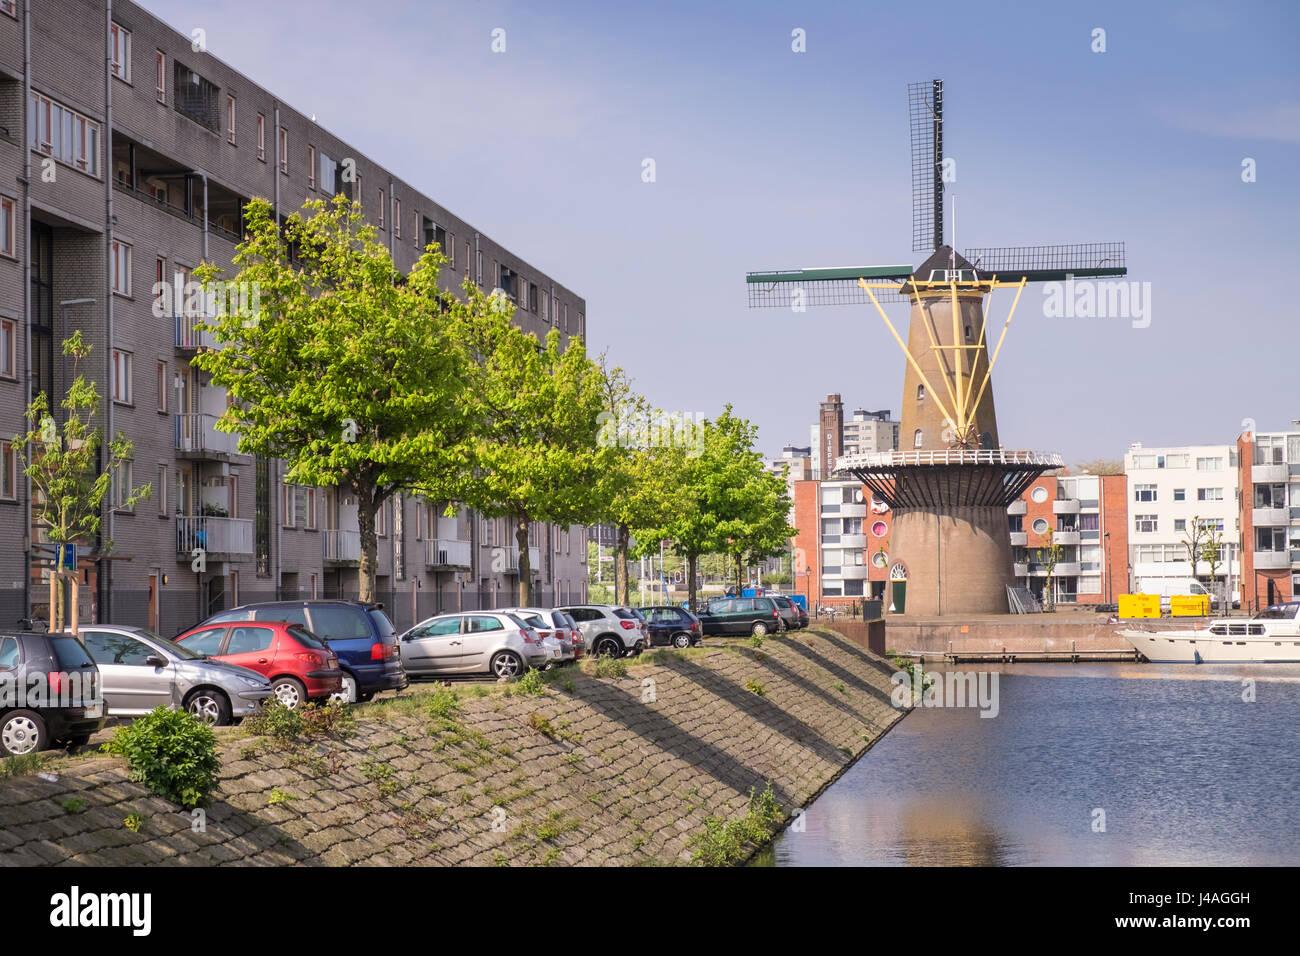 Windmill at Delfshaven, Rotterdam, The Netherlands. Stock Photo